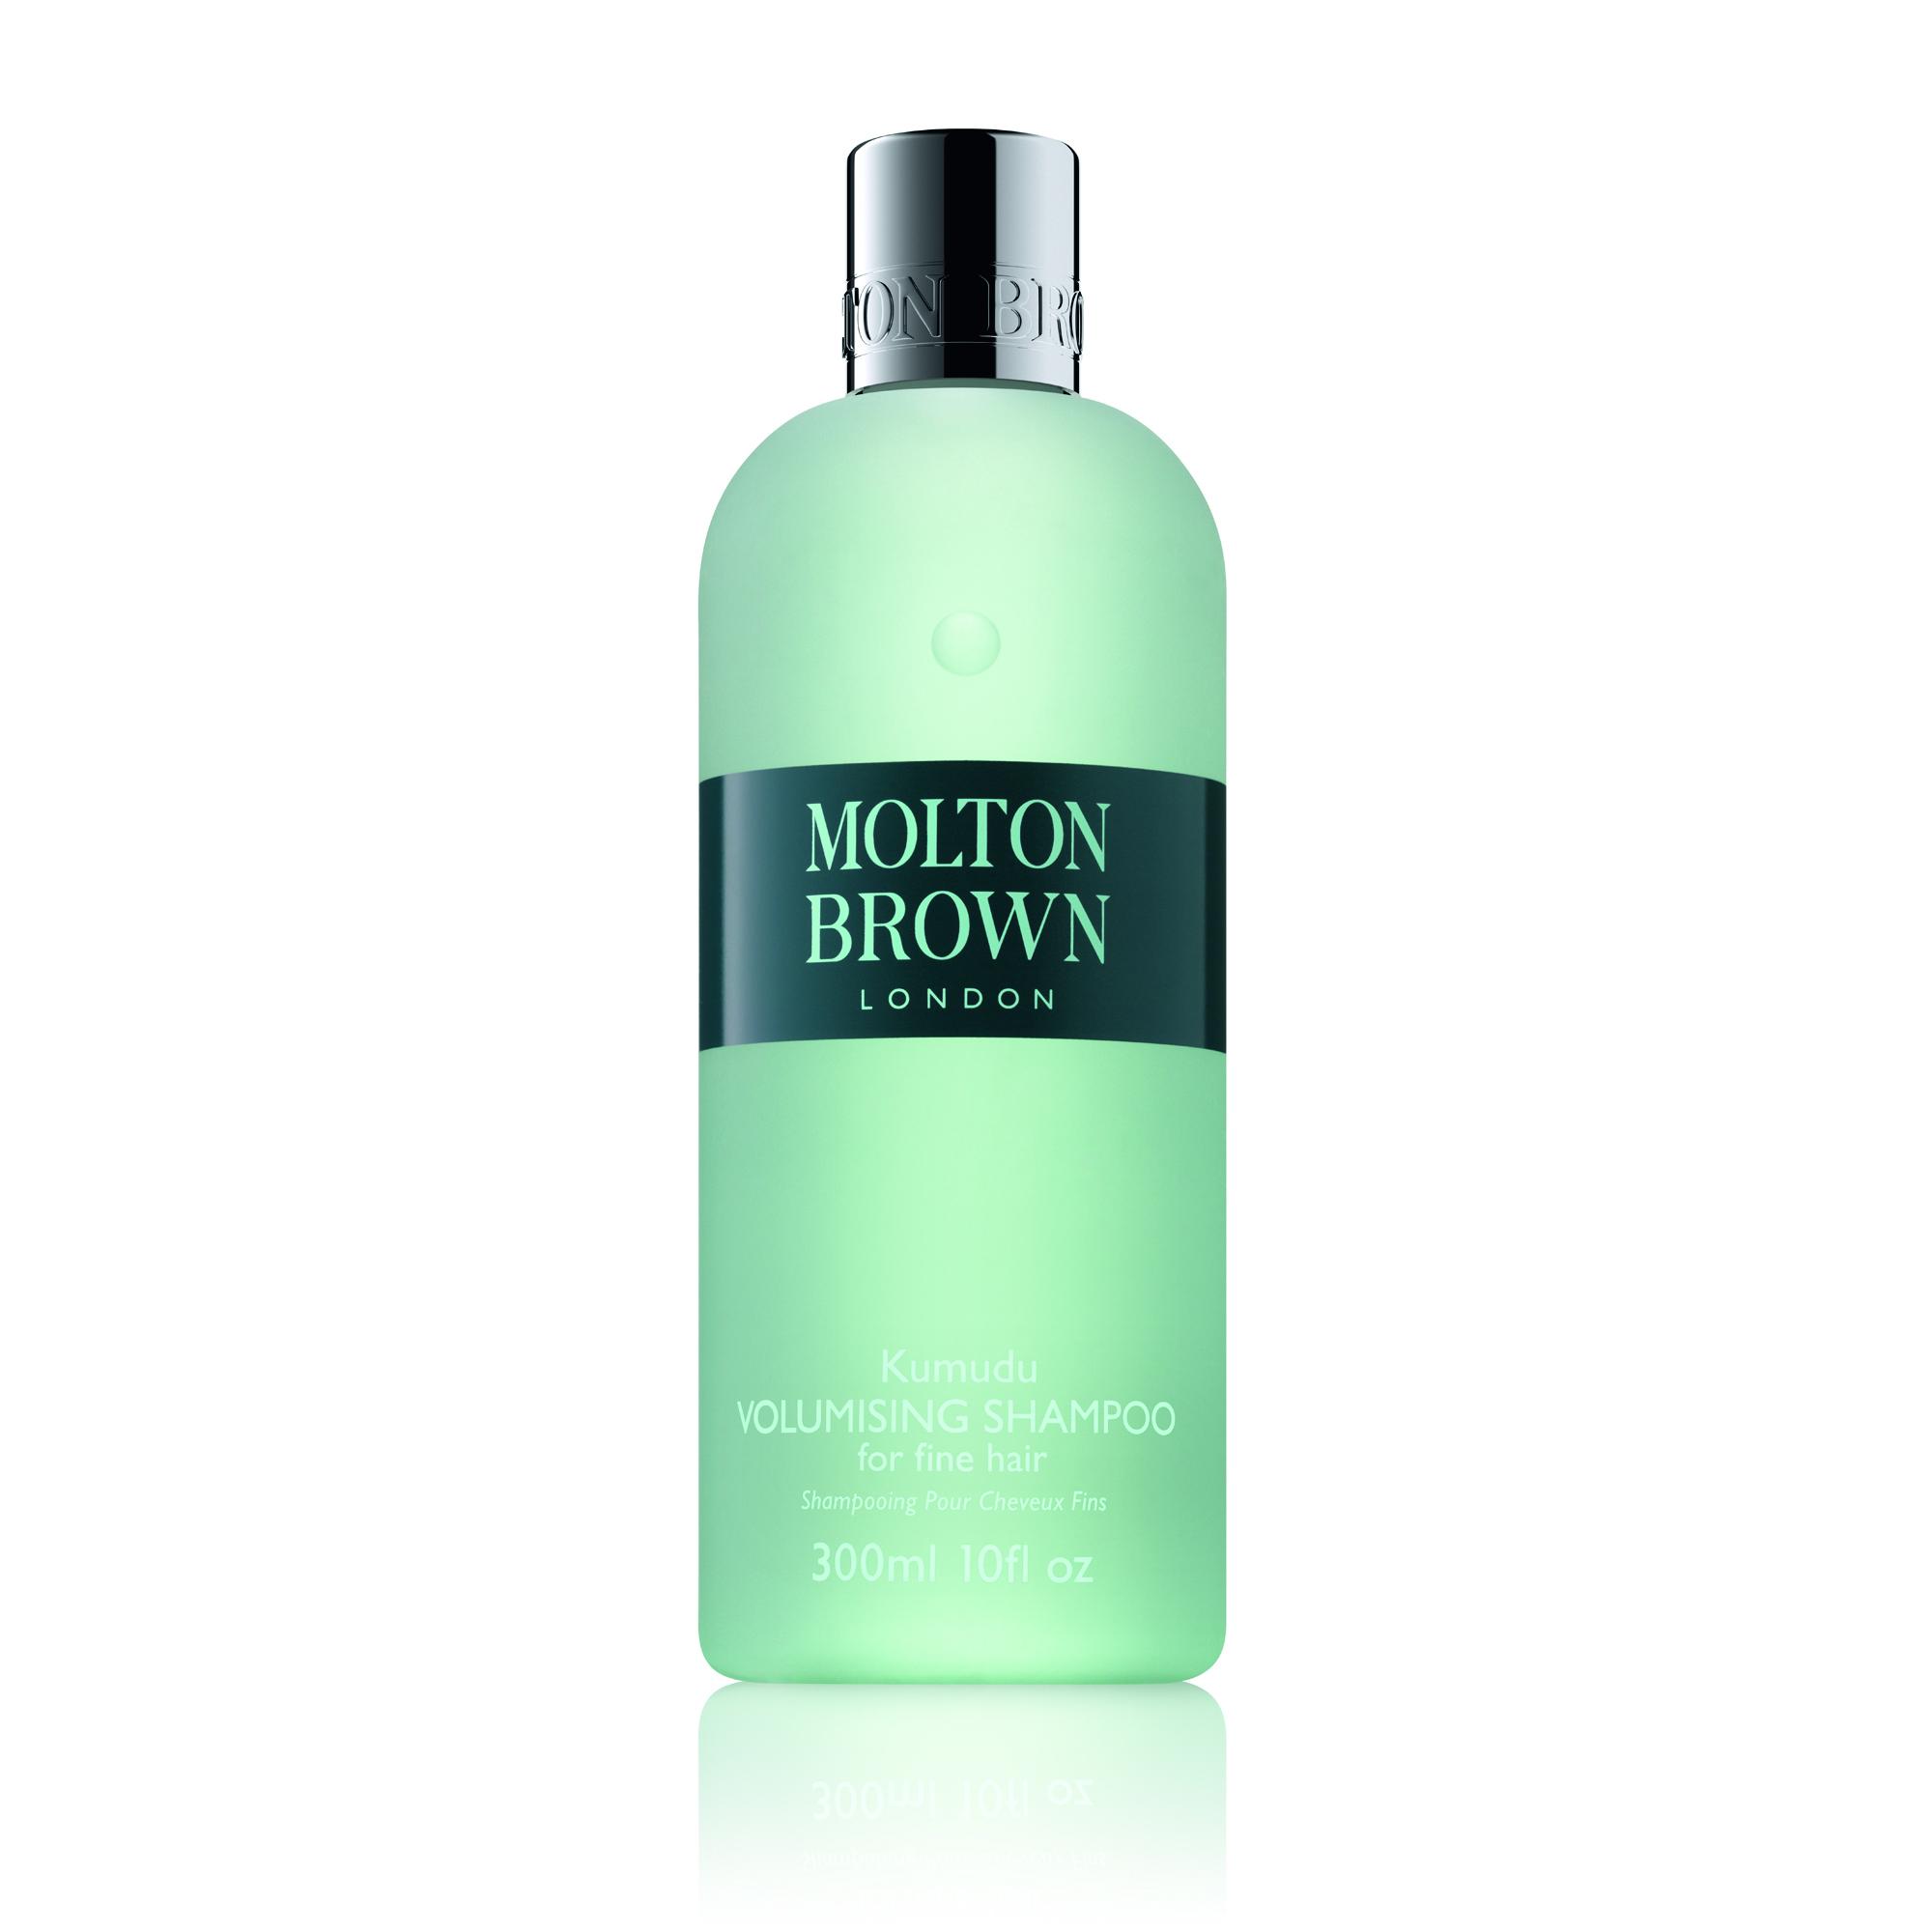 Molton Brown Bath And Shower Molton Brown Shampoo 300ml Bath And Body Bath And Body